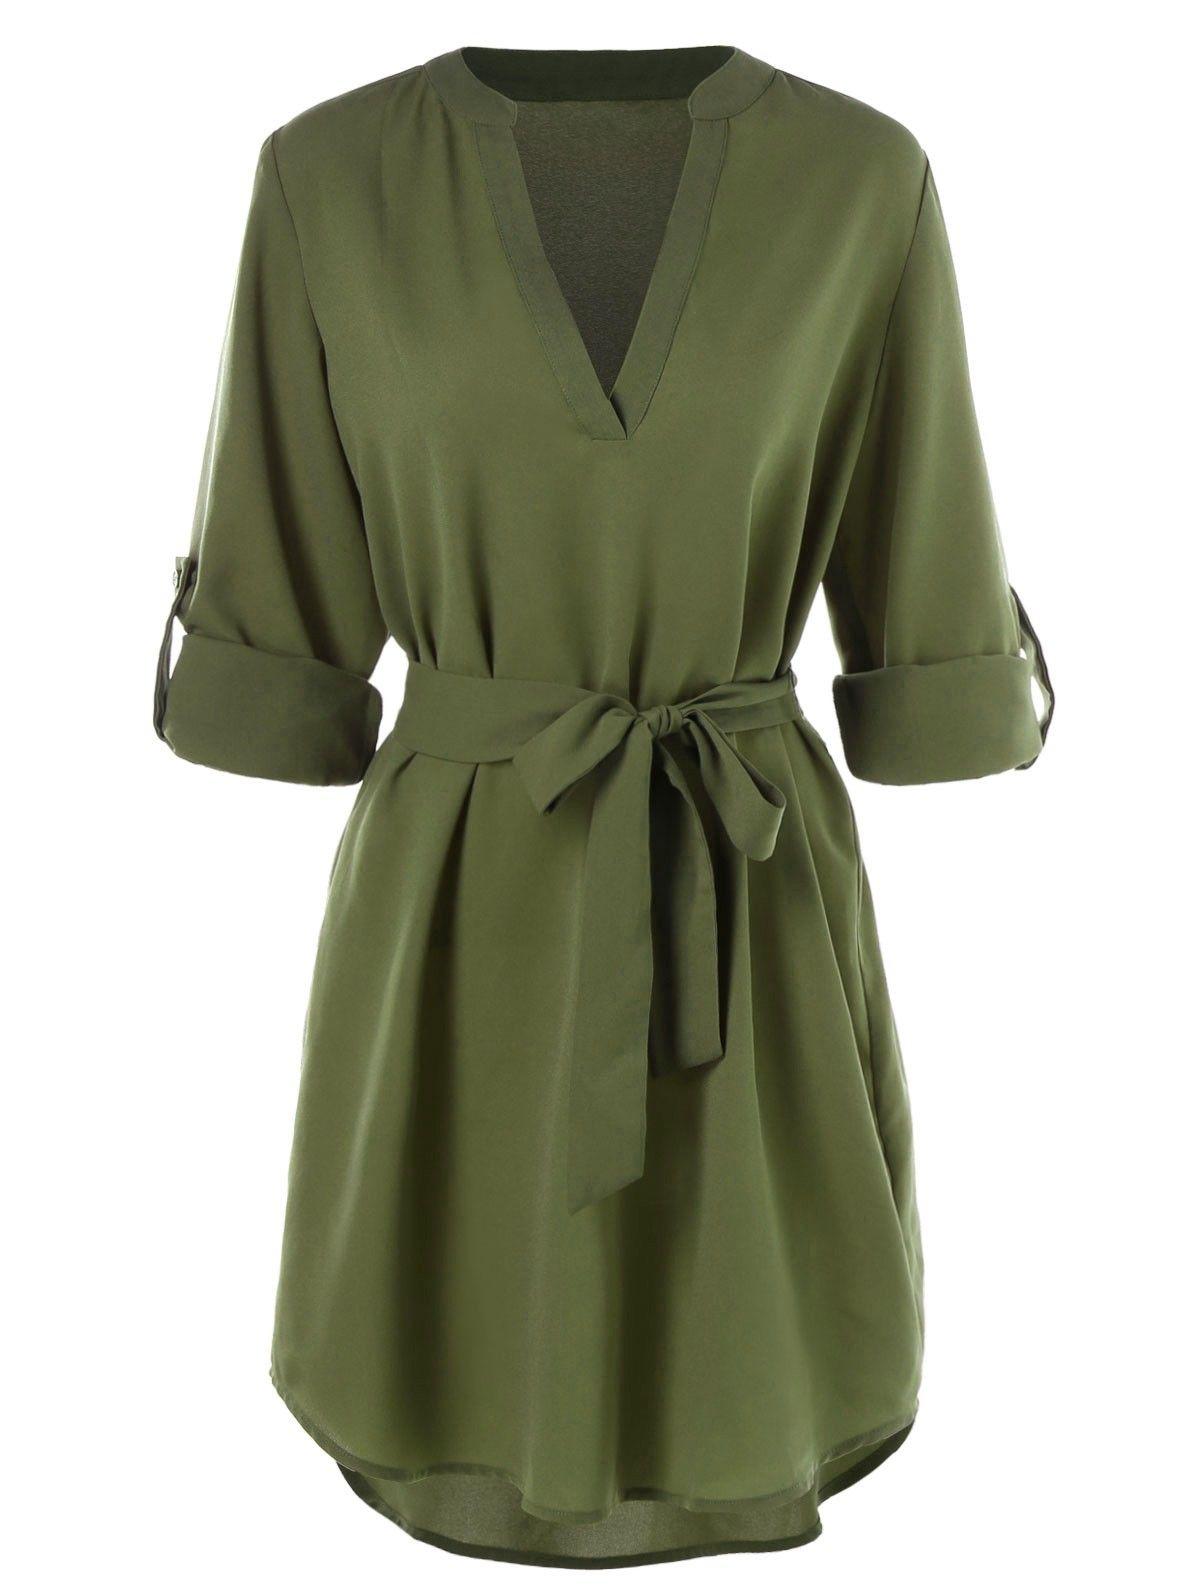 Casual Belted Knee Length Dress Army Green 3877665212 Original Design Women S Clot Knee Length Dresses Casual Green Dress Casual Long Sleeve Casual Dress [ 1596 x 1200 Pixel ]